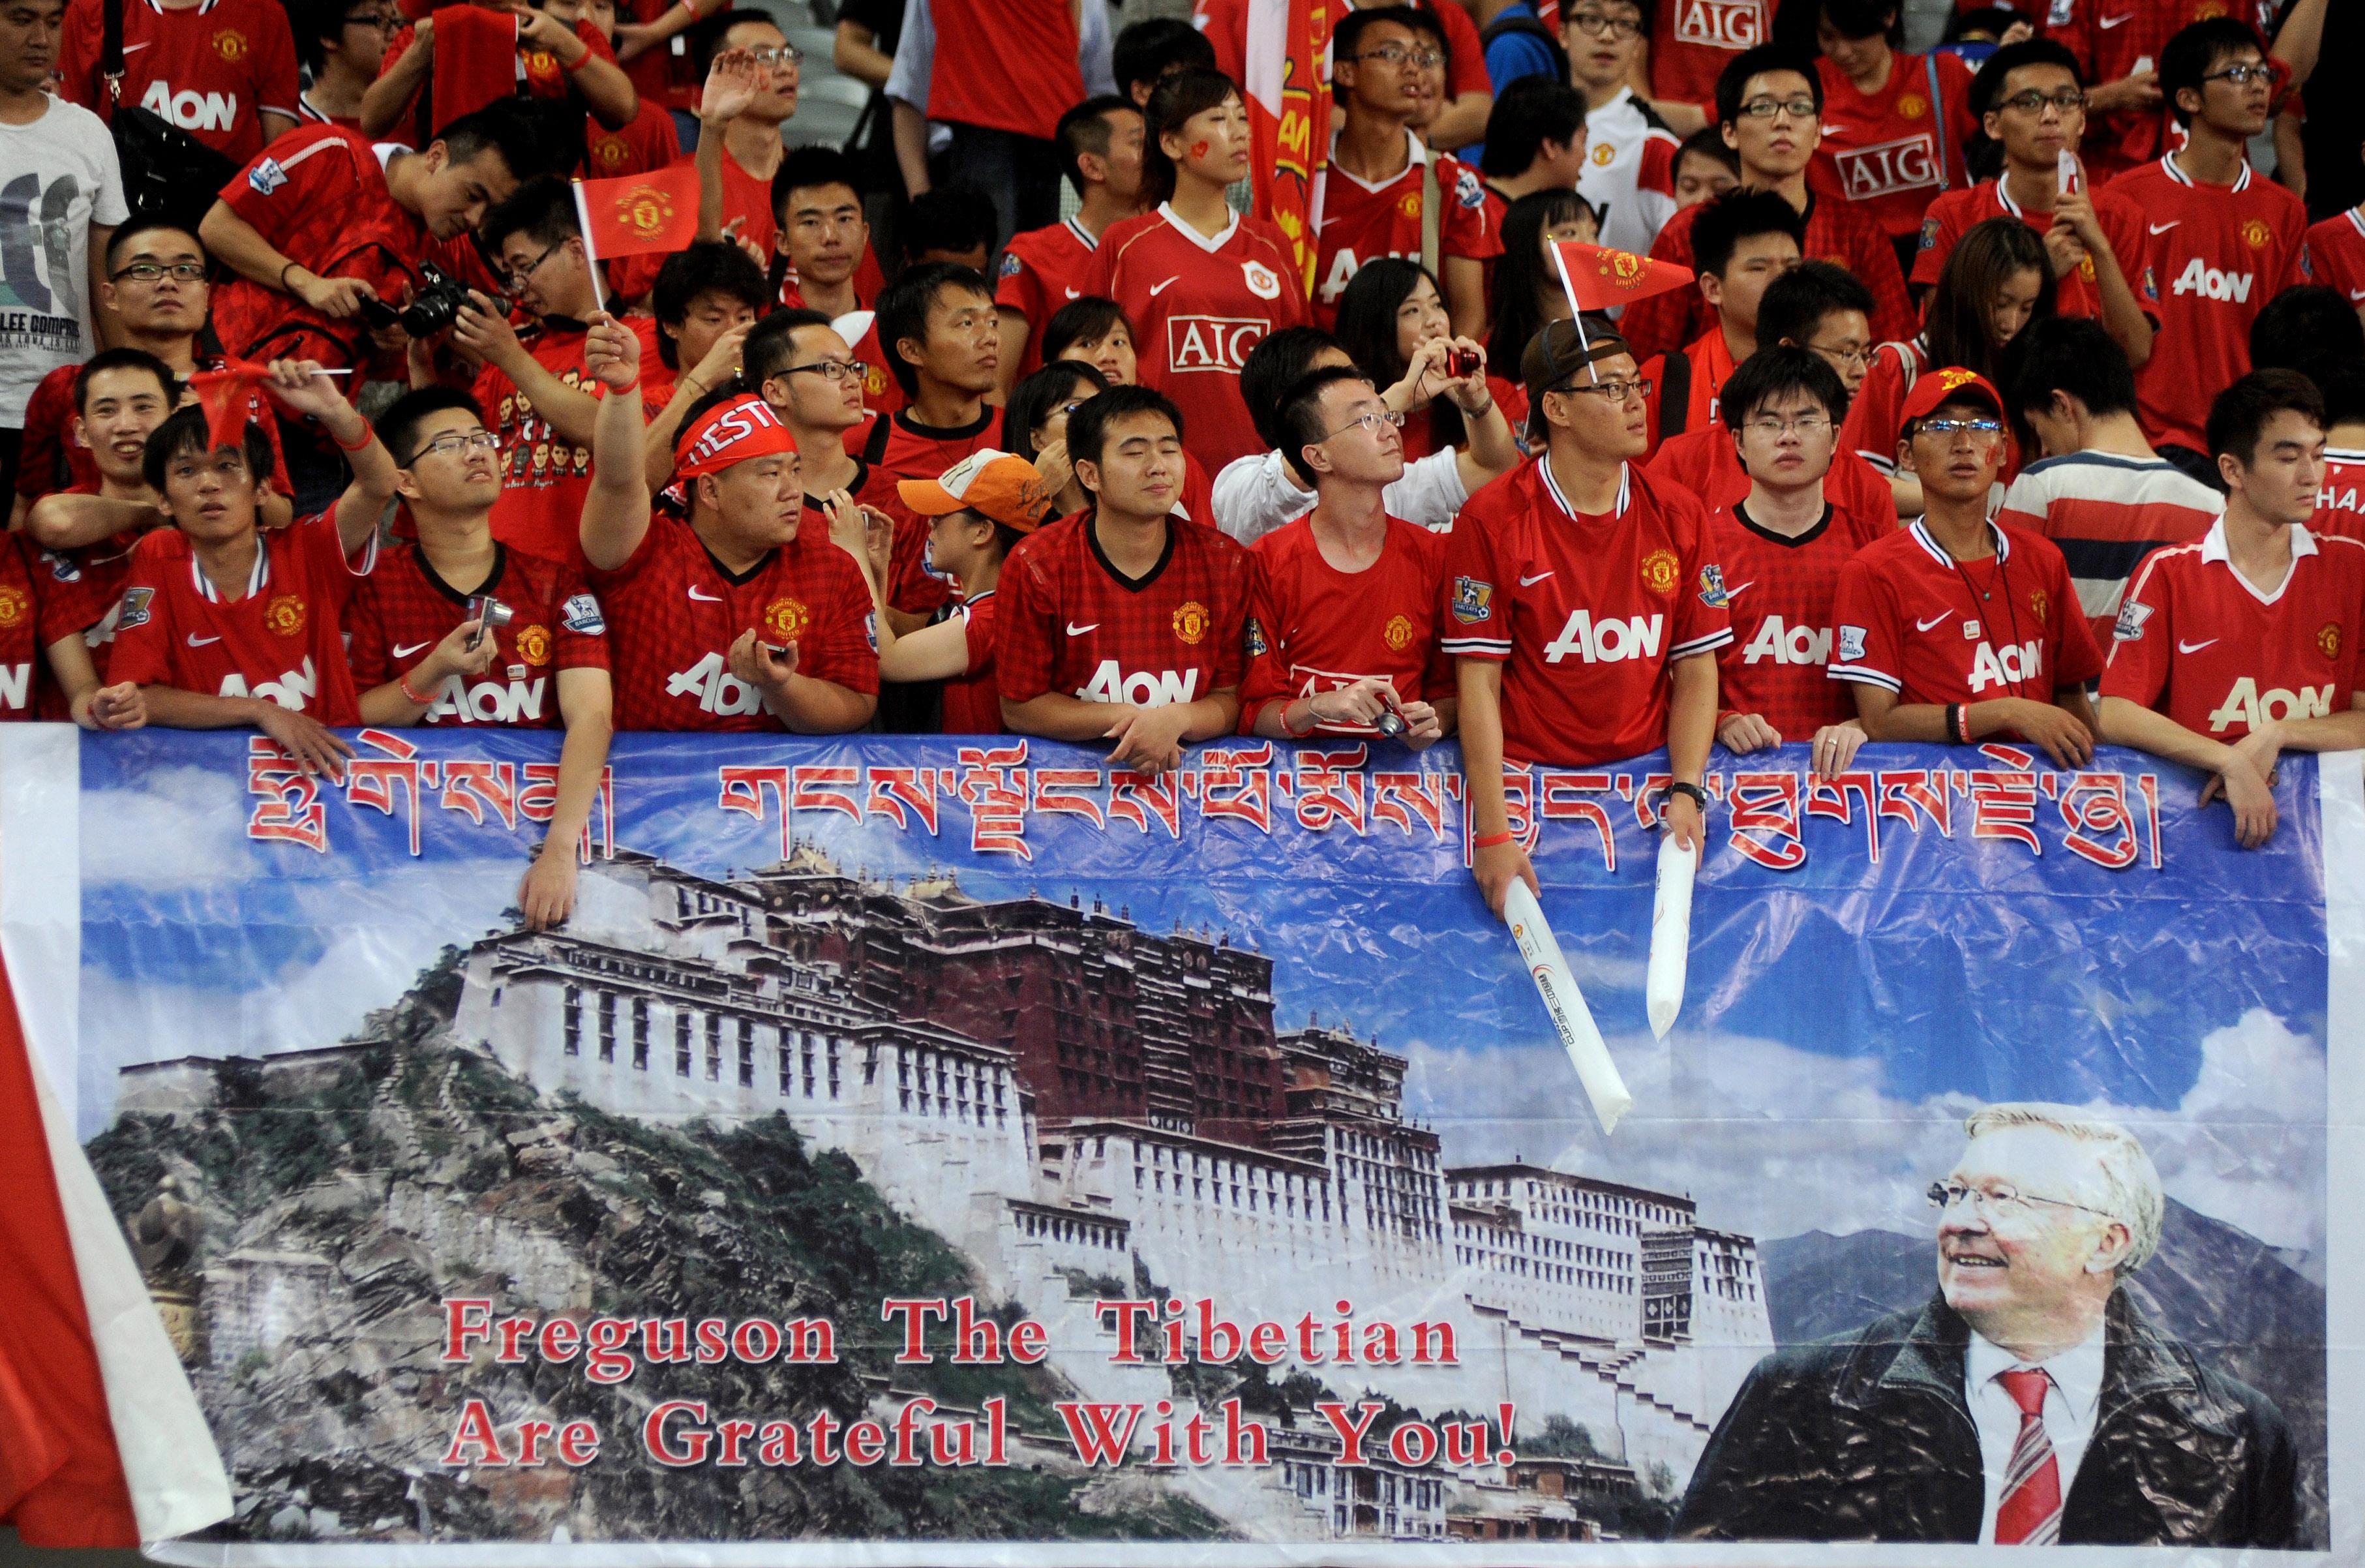 Shanghai Shenhua v Manchester United